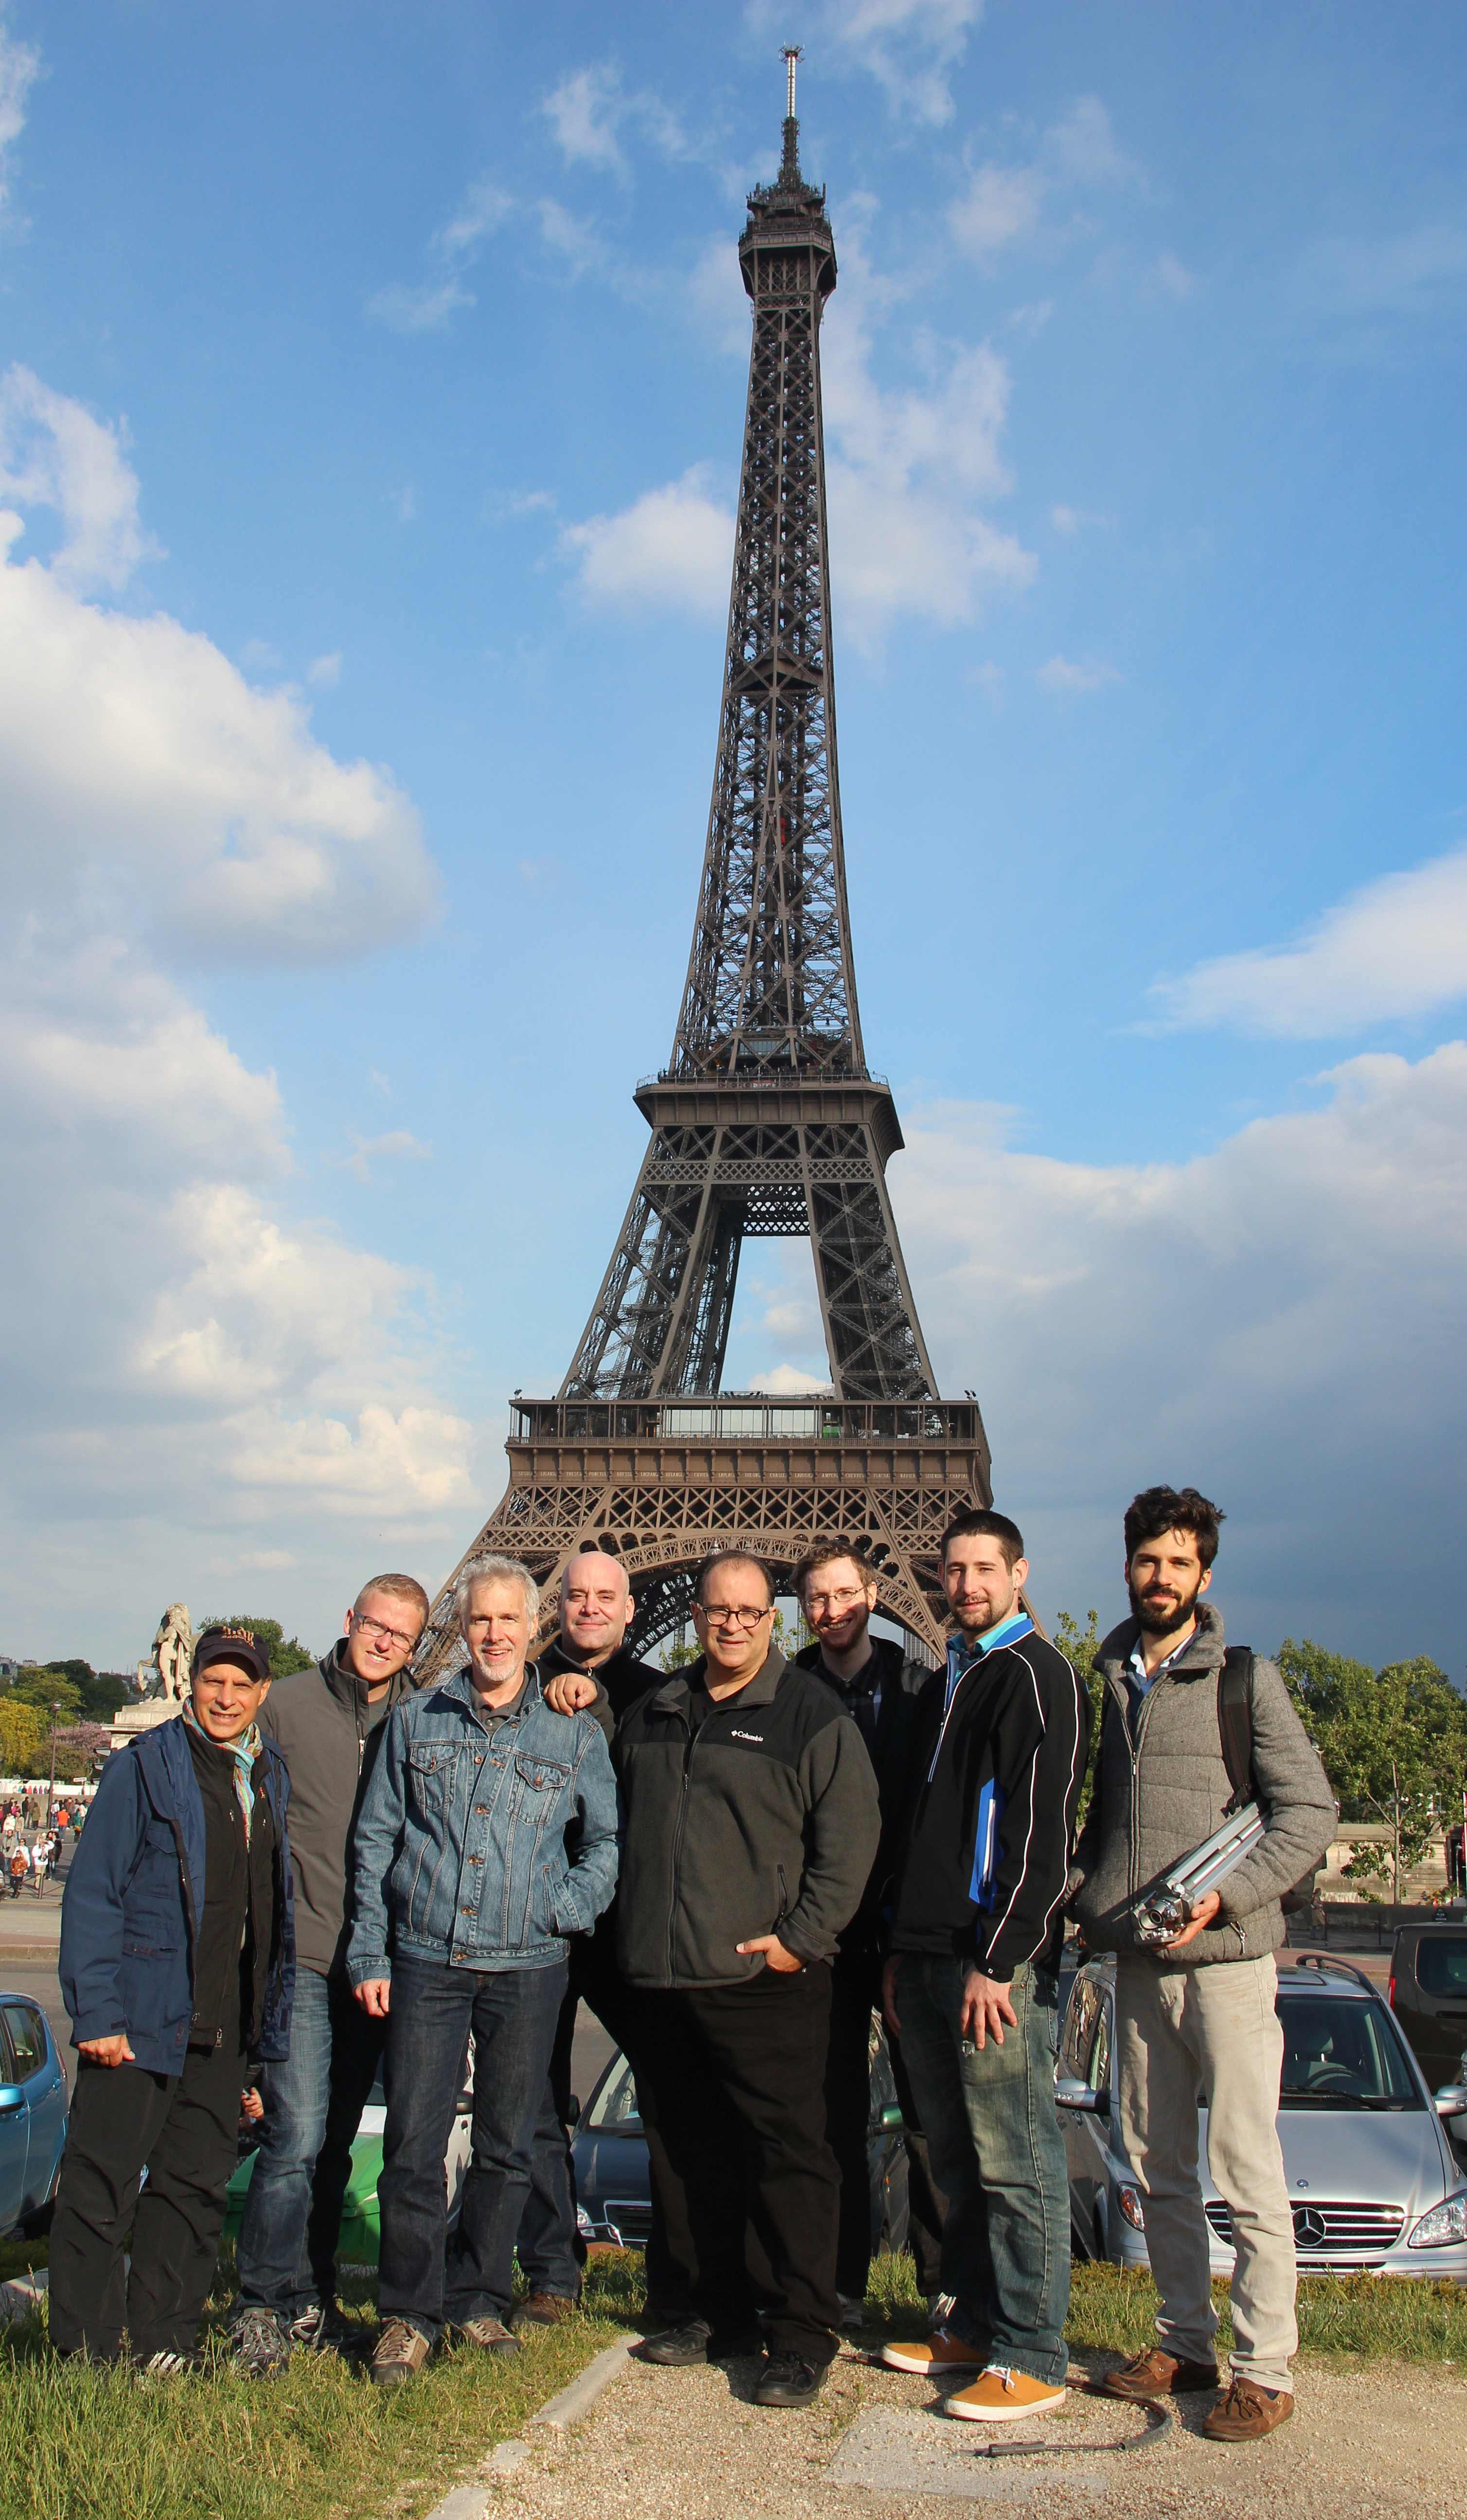 Tower Music team, 5-26-13